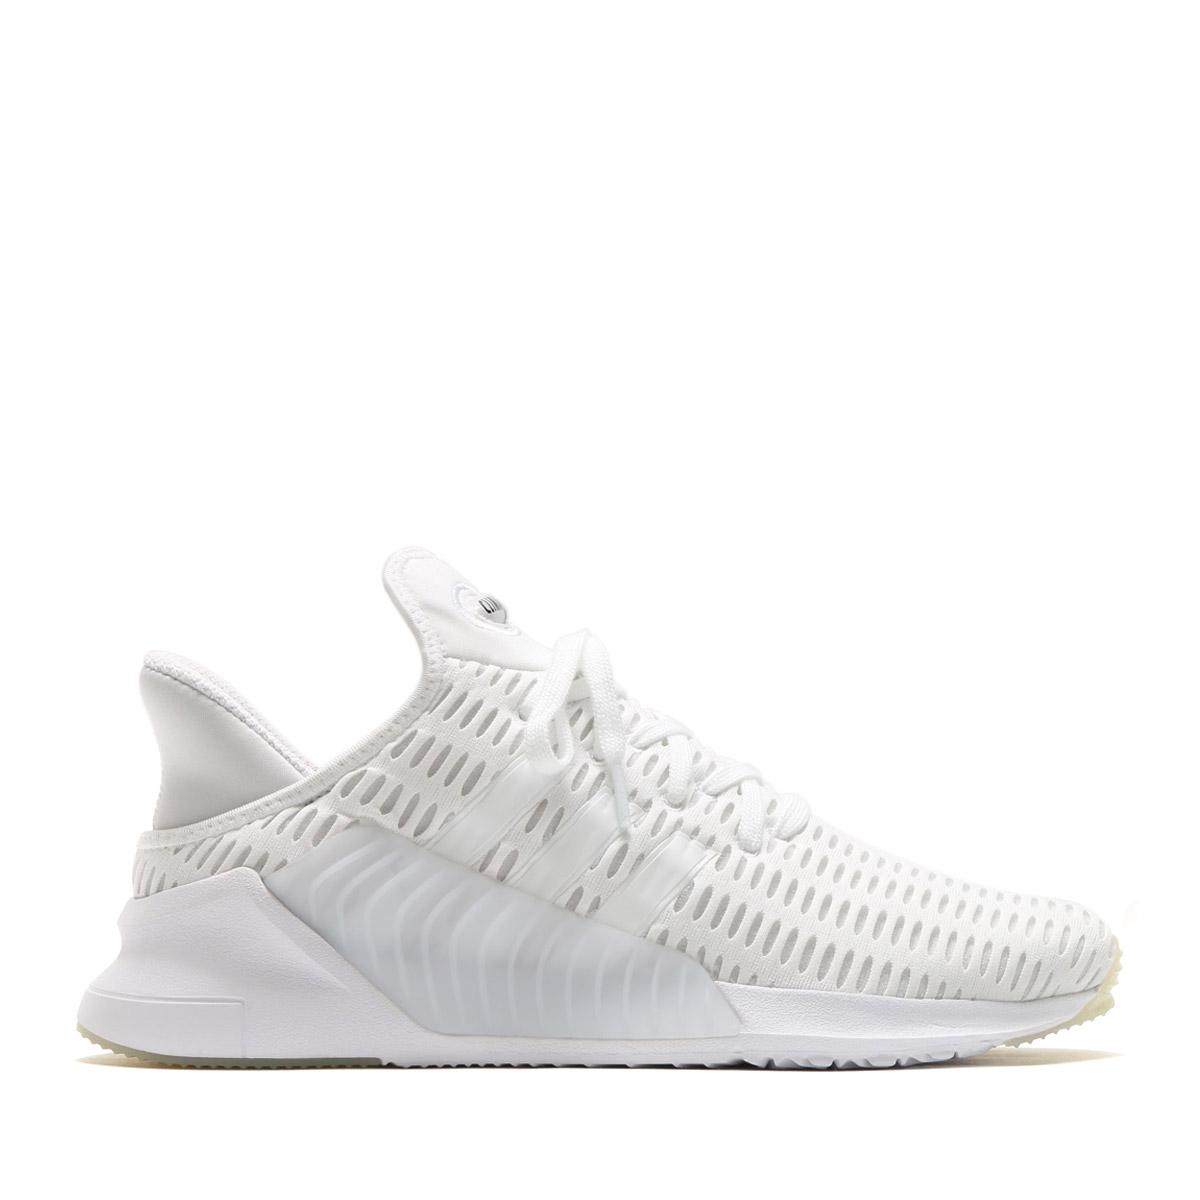 half off 36f3b 09276 adidas Original CLIMACOOL 02/17 (アディダスオリジナルスクライマクール 02/17) RUNNING  WHITE/RUNNING WHITE17FW-S